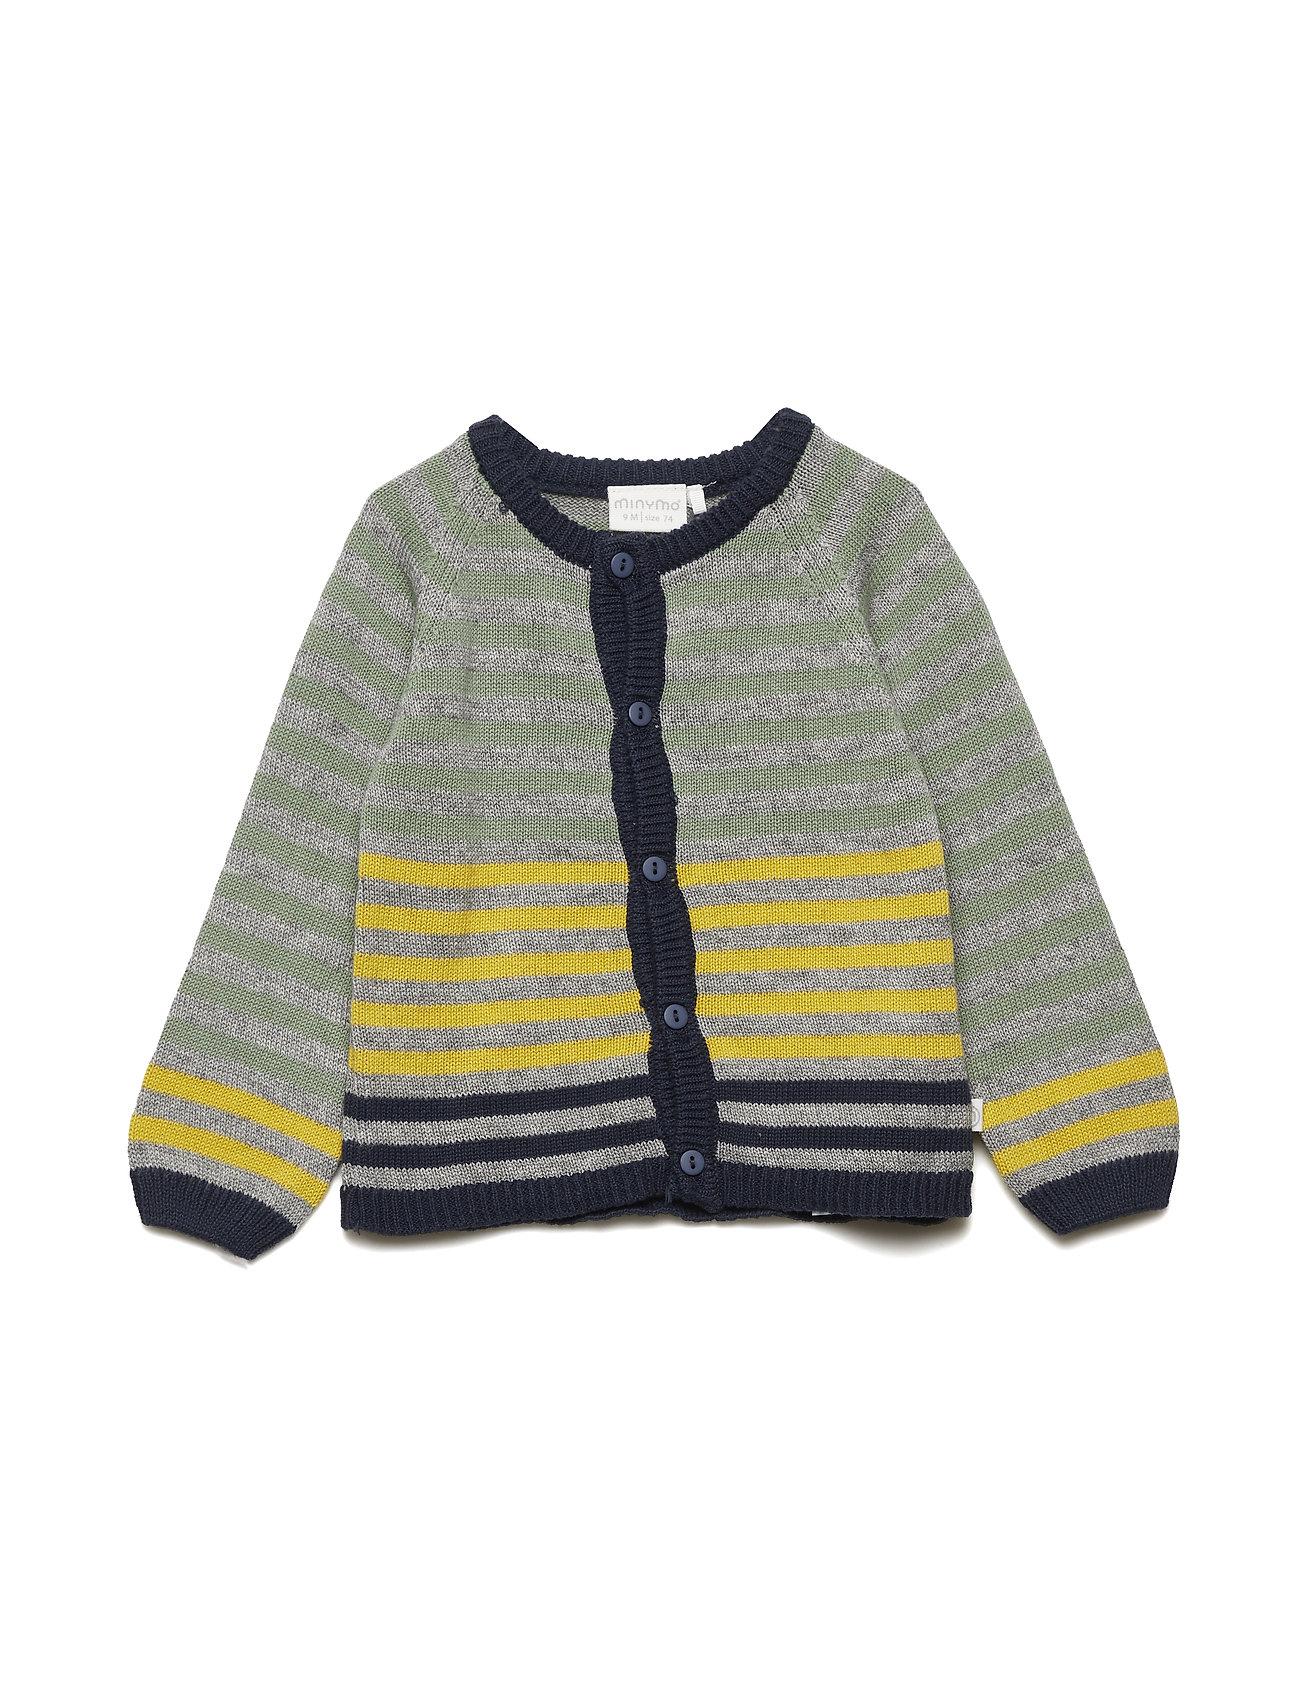 Cardigan Knit - Minymo